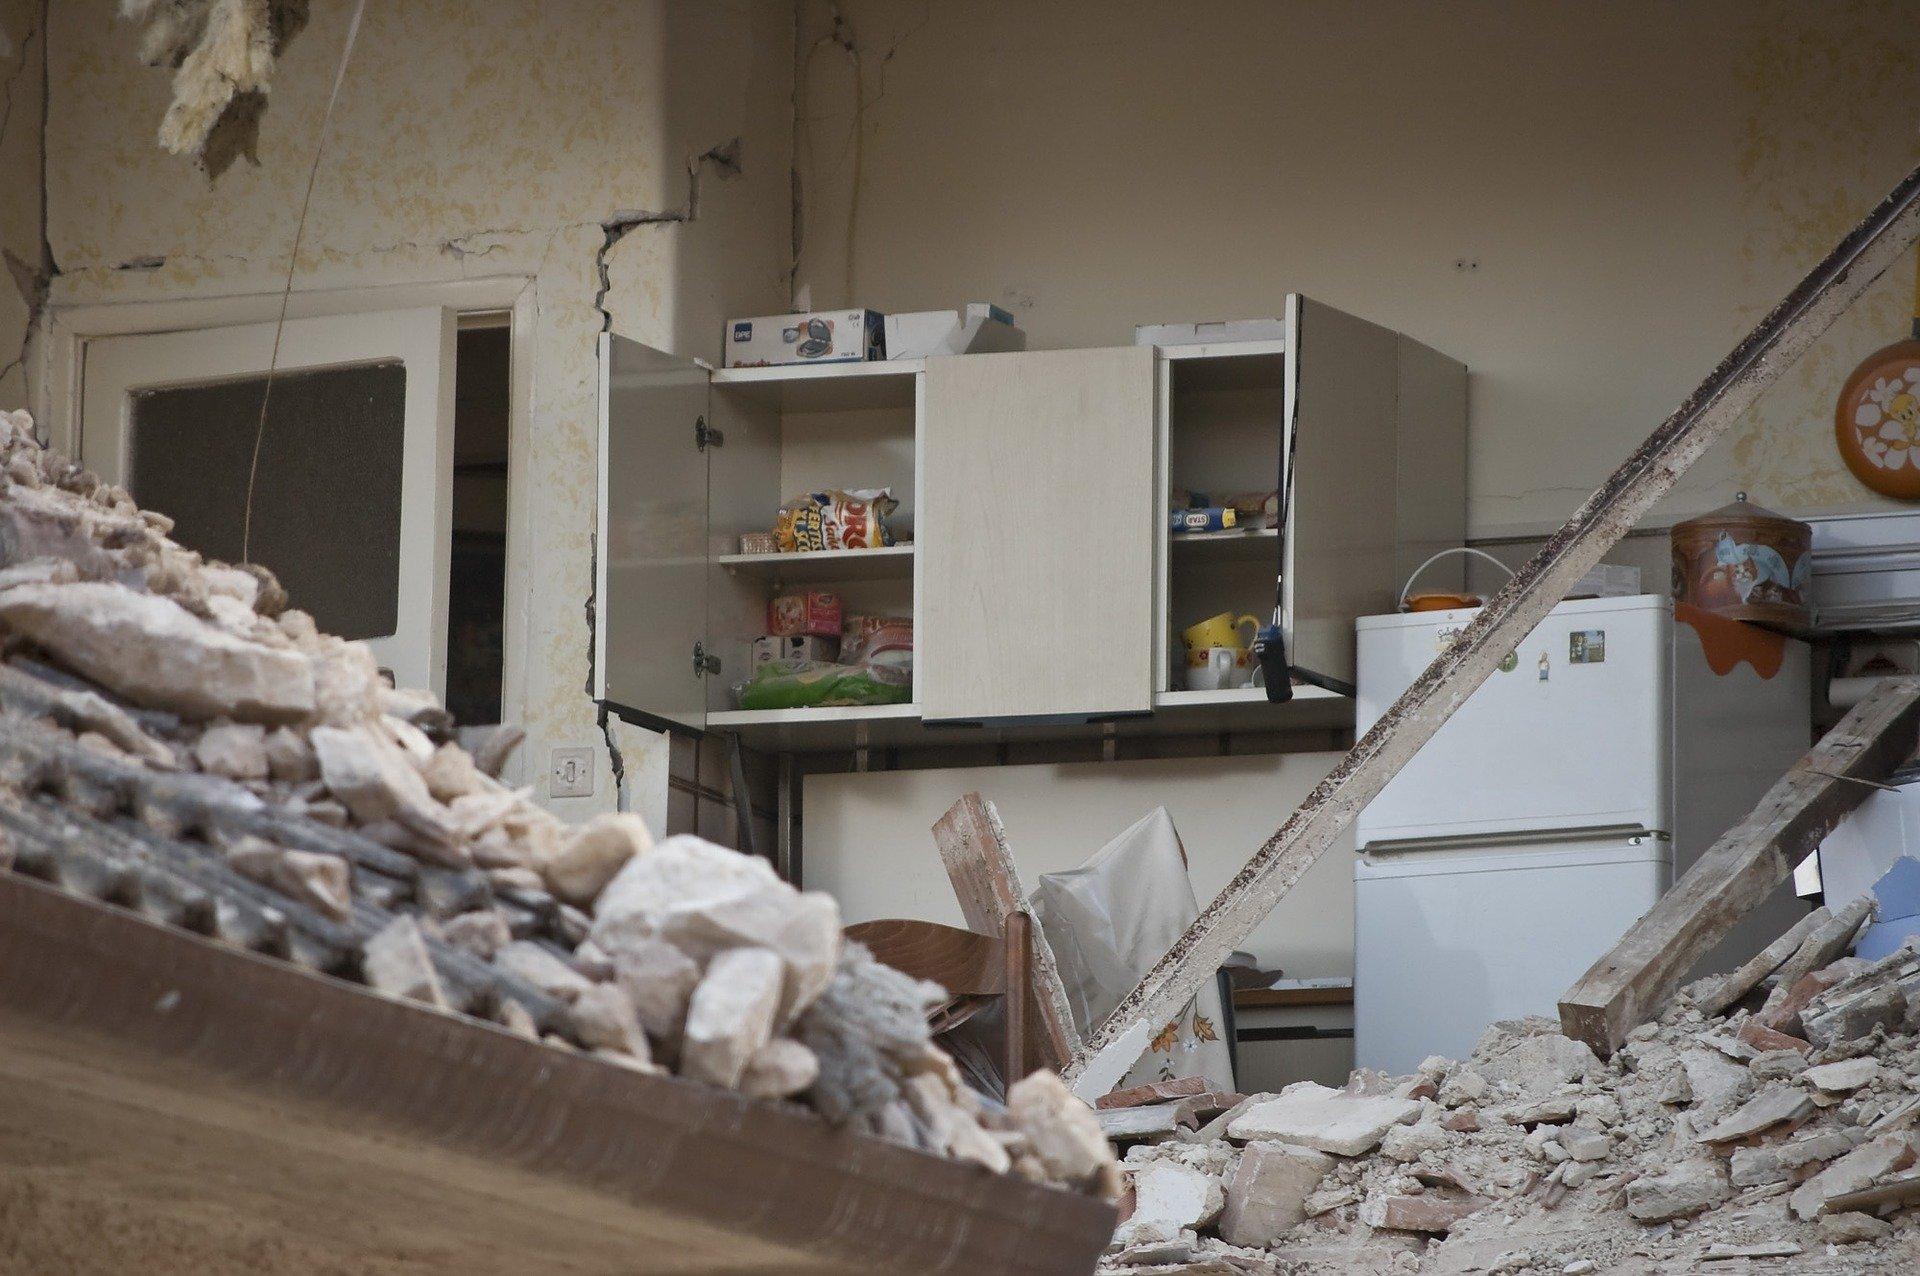 san francisco earthquake mitigation film